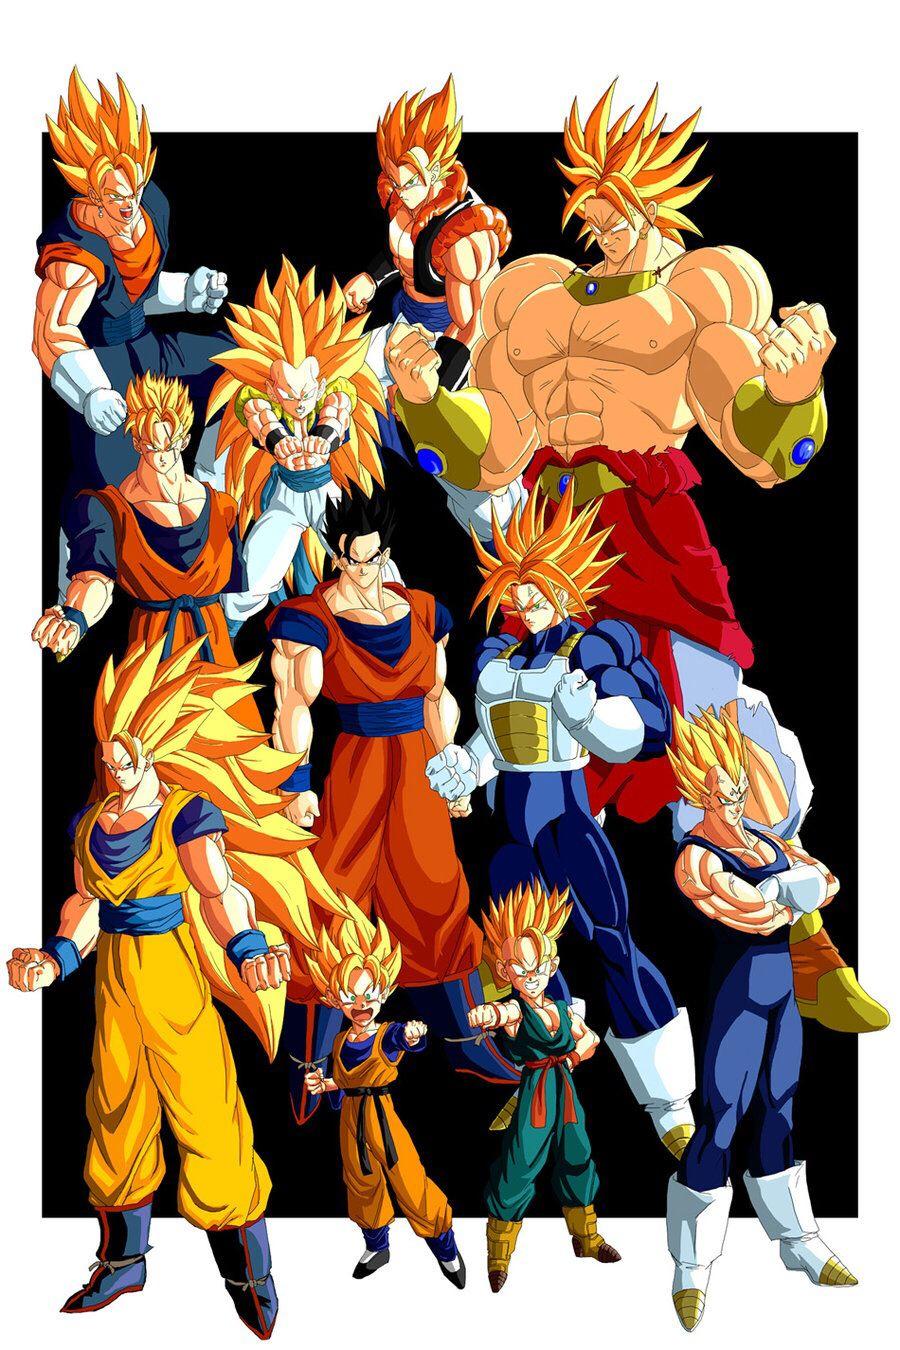 Goku Vegeta Broly Gohan Trunks Goten Gogeta Gotenks Vegito Future Gohan Amp Future Trun Dragon Ball Super Manga Dragon Ball Art Dragon Ball Artwork